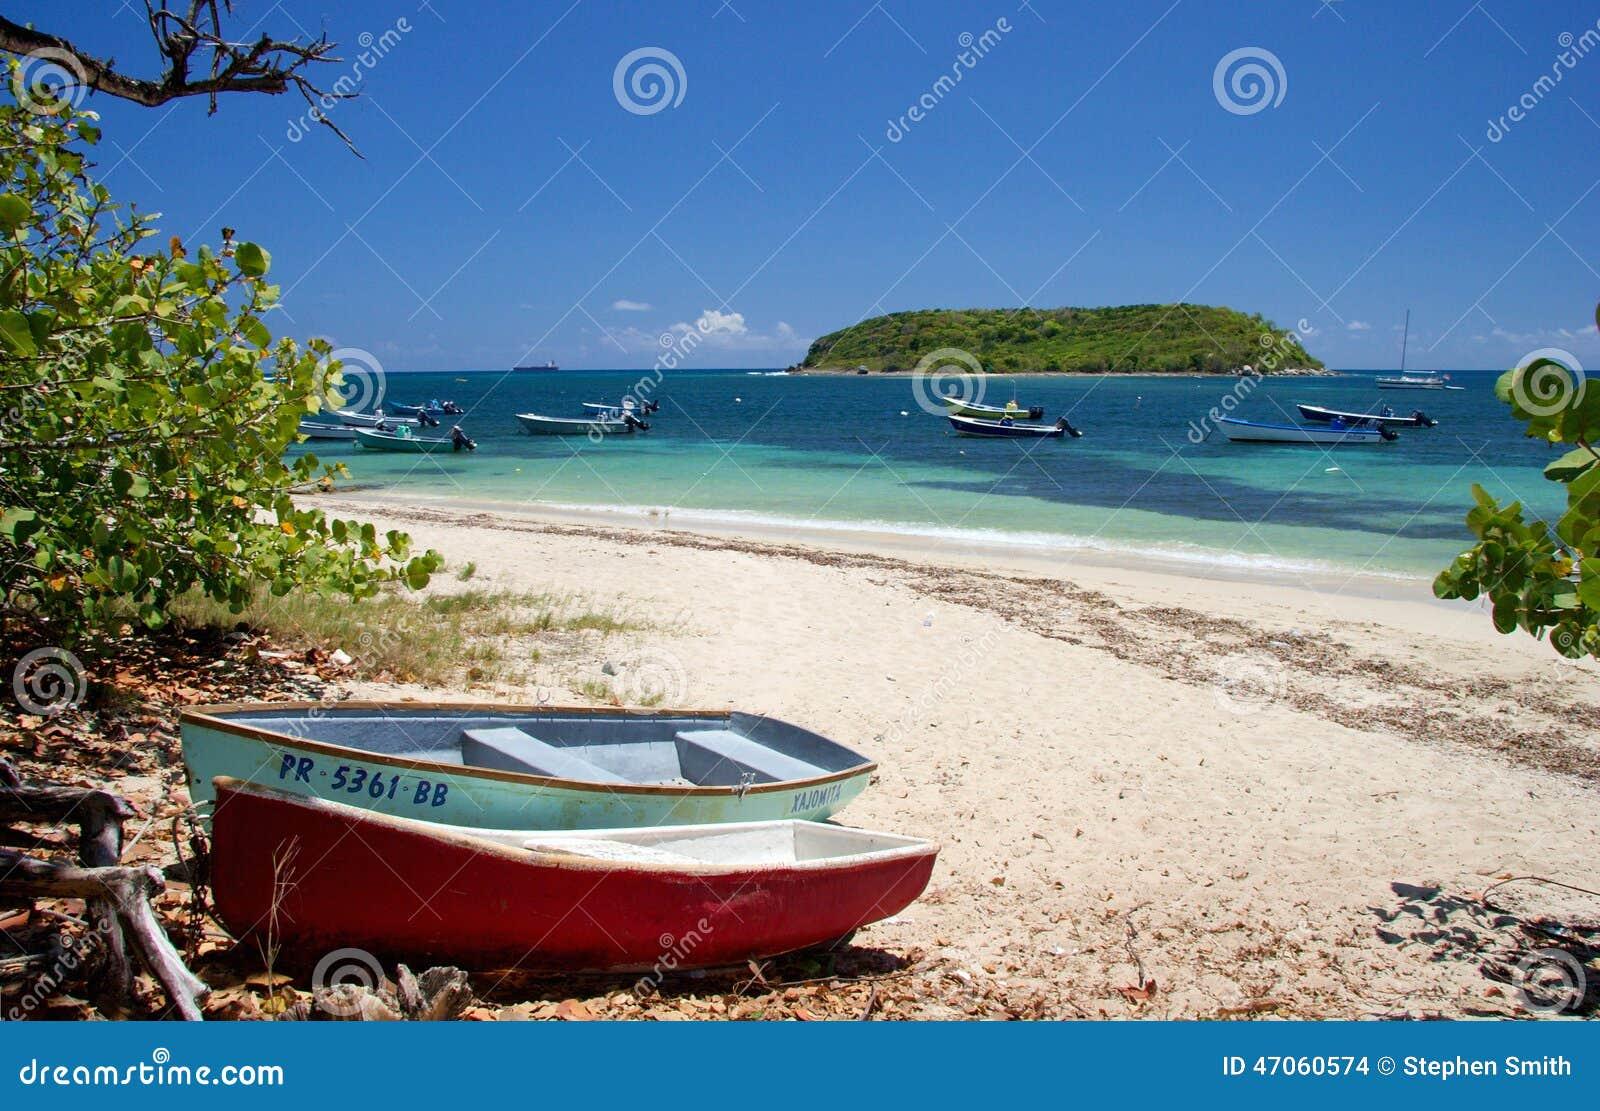 Barcos de pesca na praia, ilha de Vieques, Porto Rico